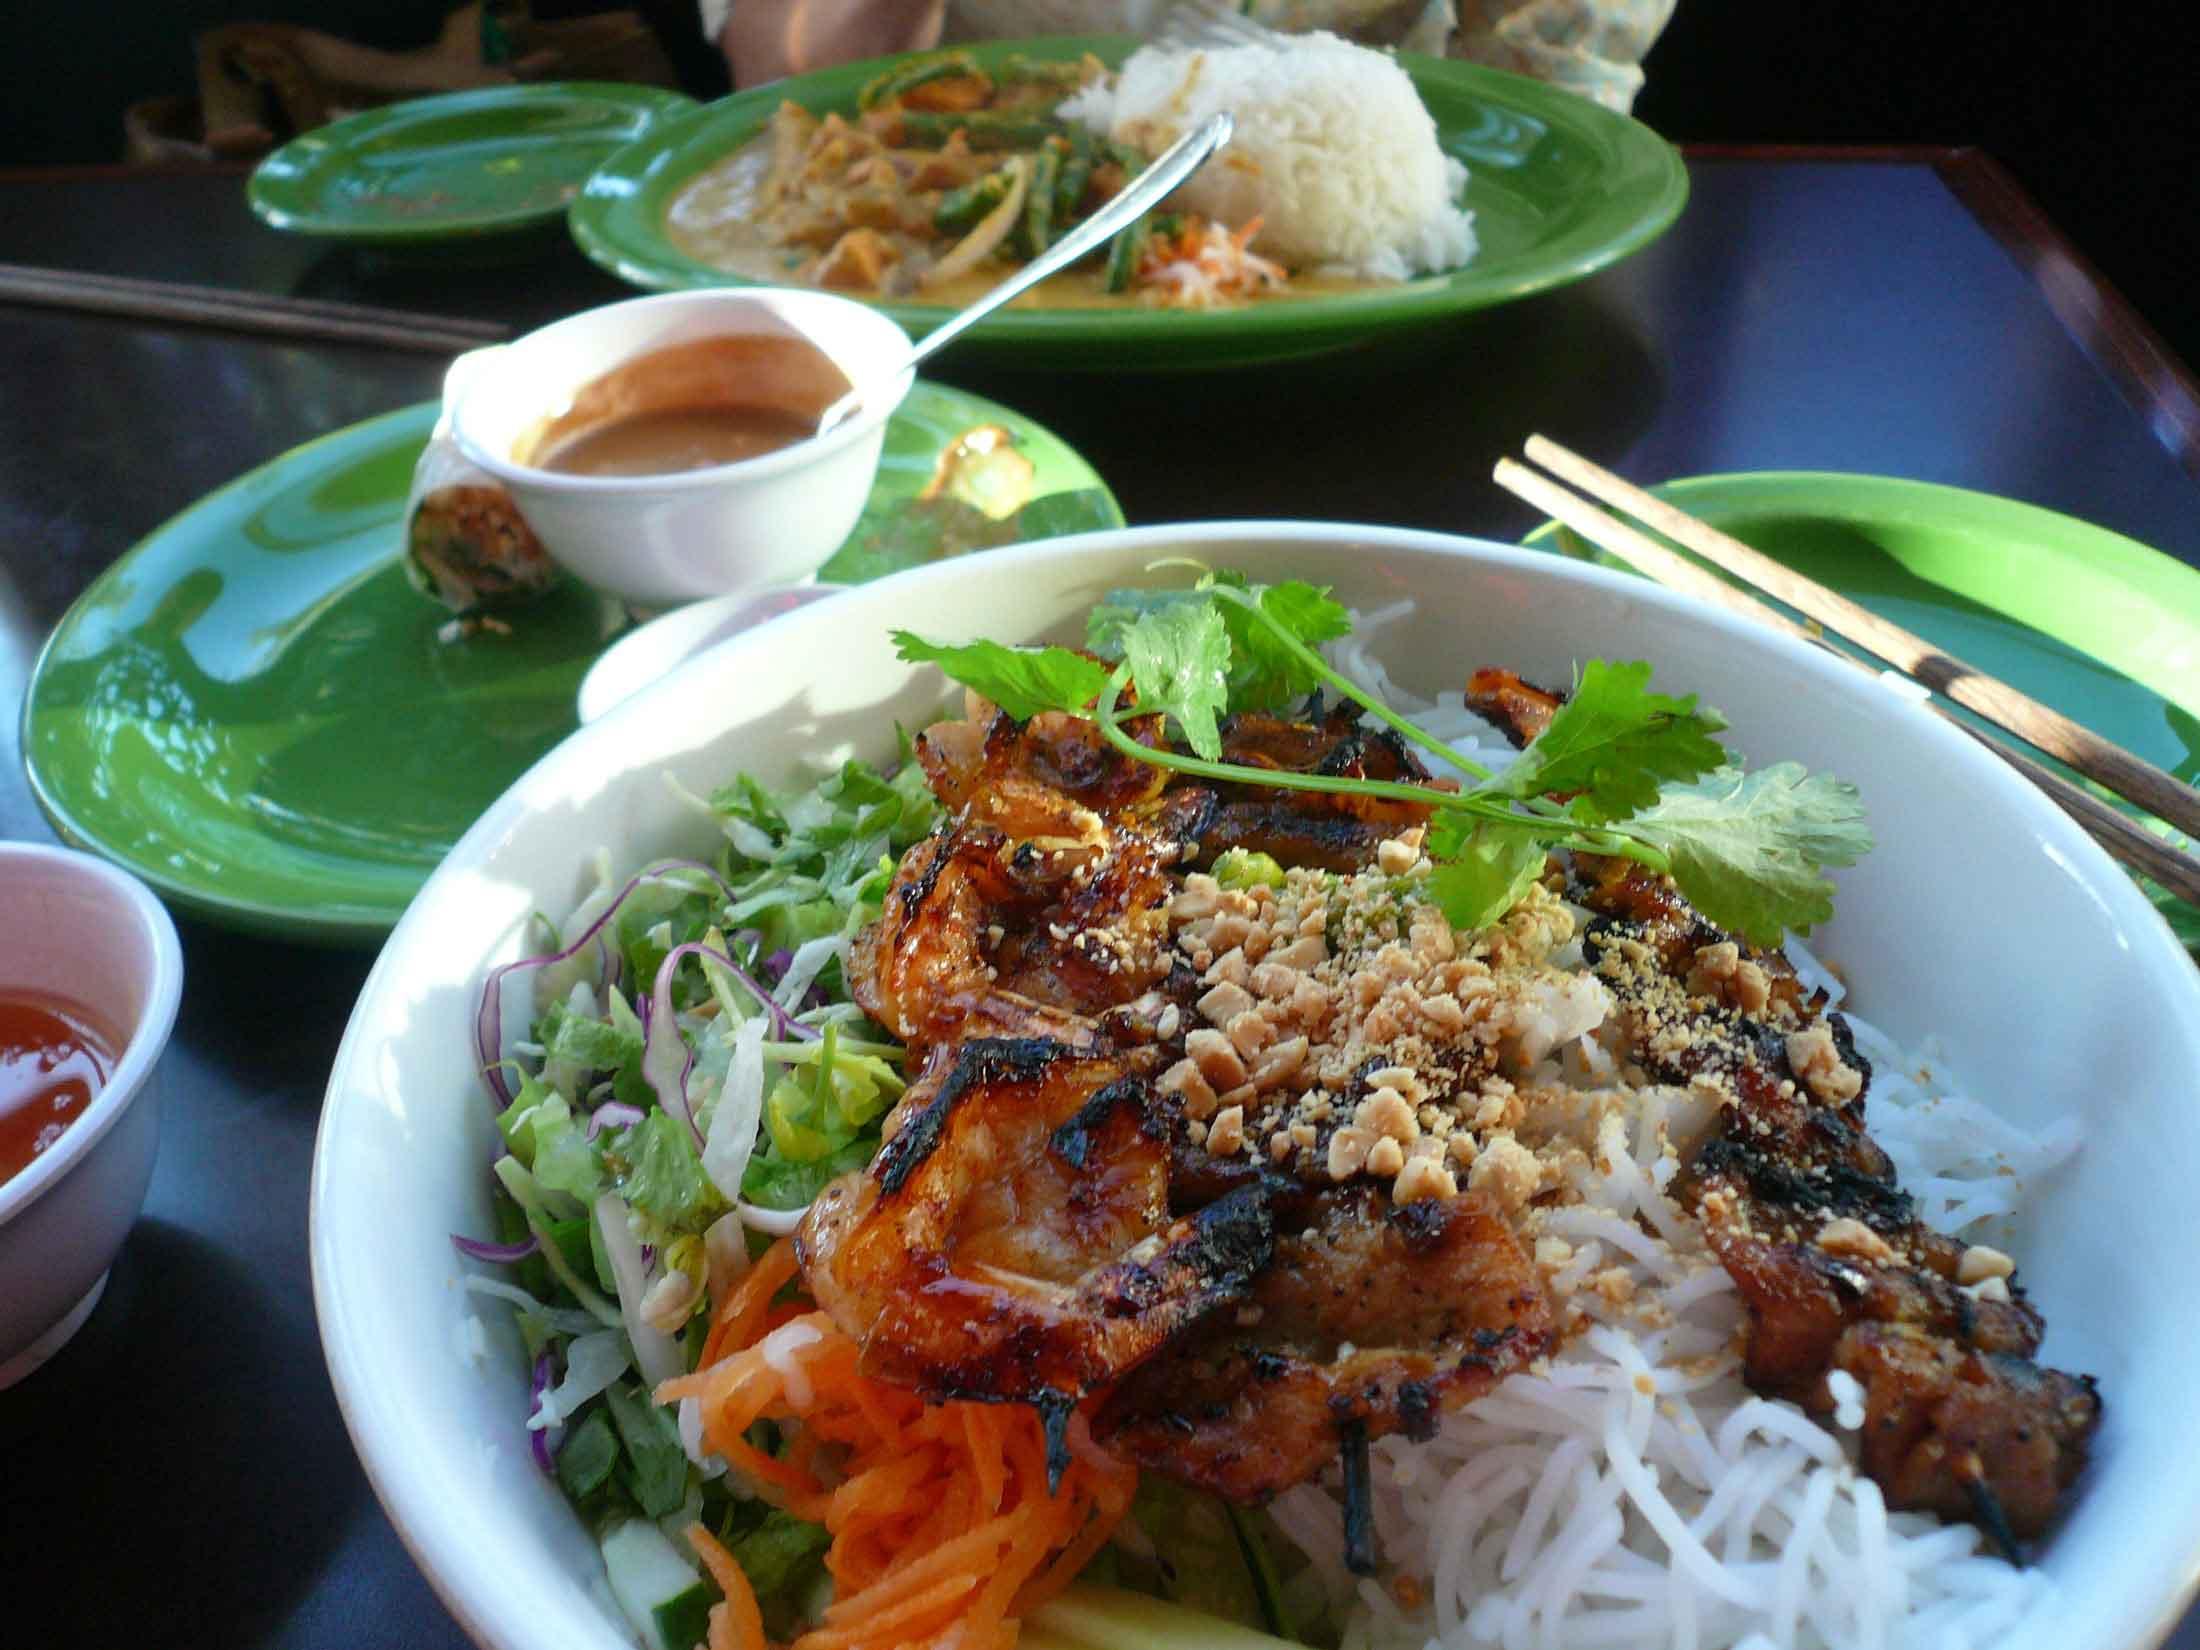 Vietnam Gourmet Restaurant, Millswood, SA - GrubFinder